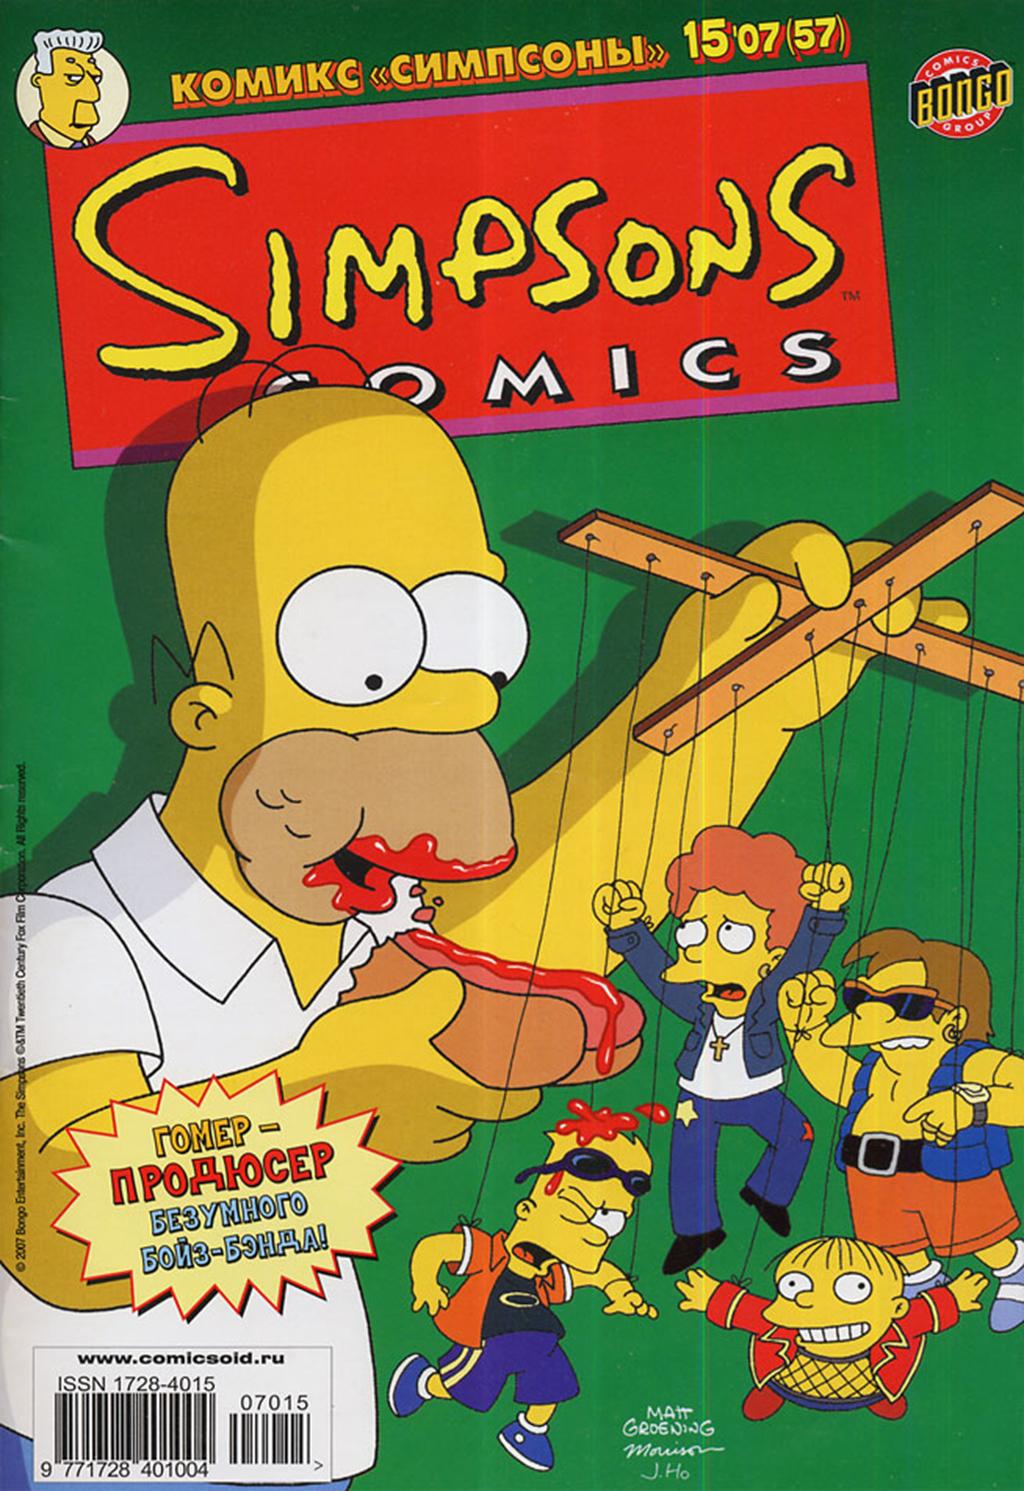 Комикс Симпсоны